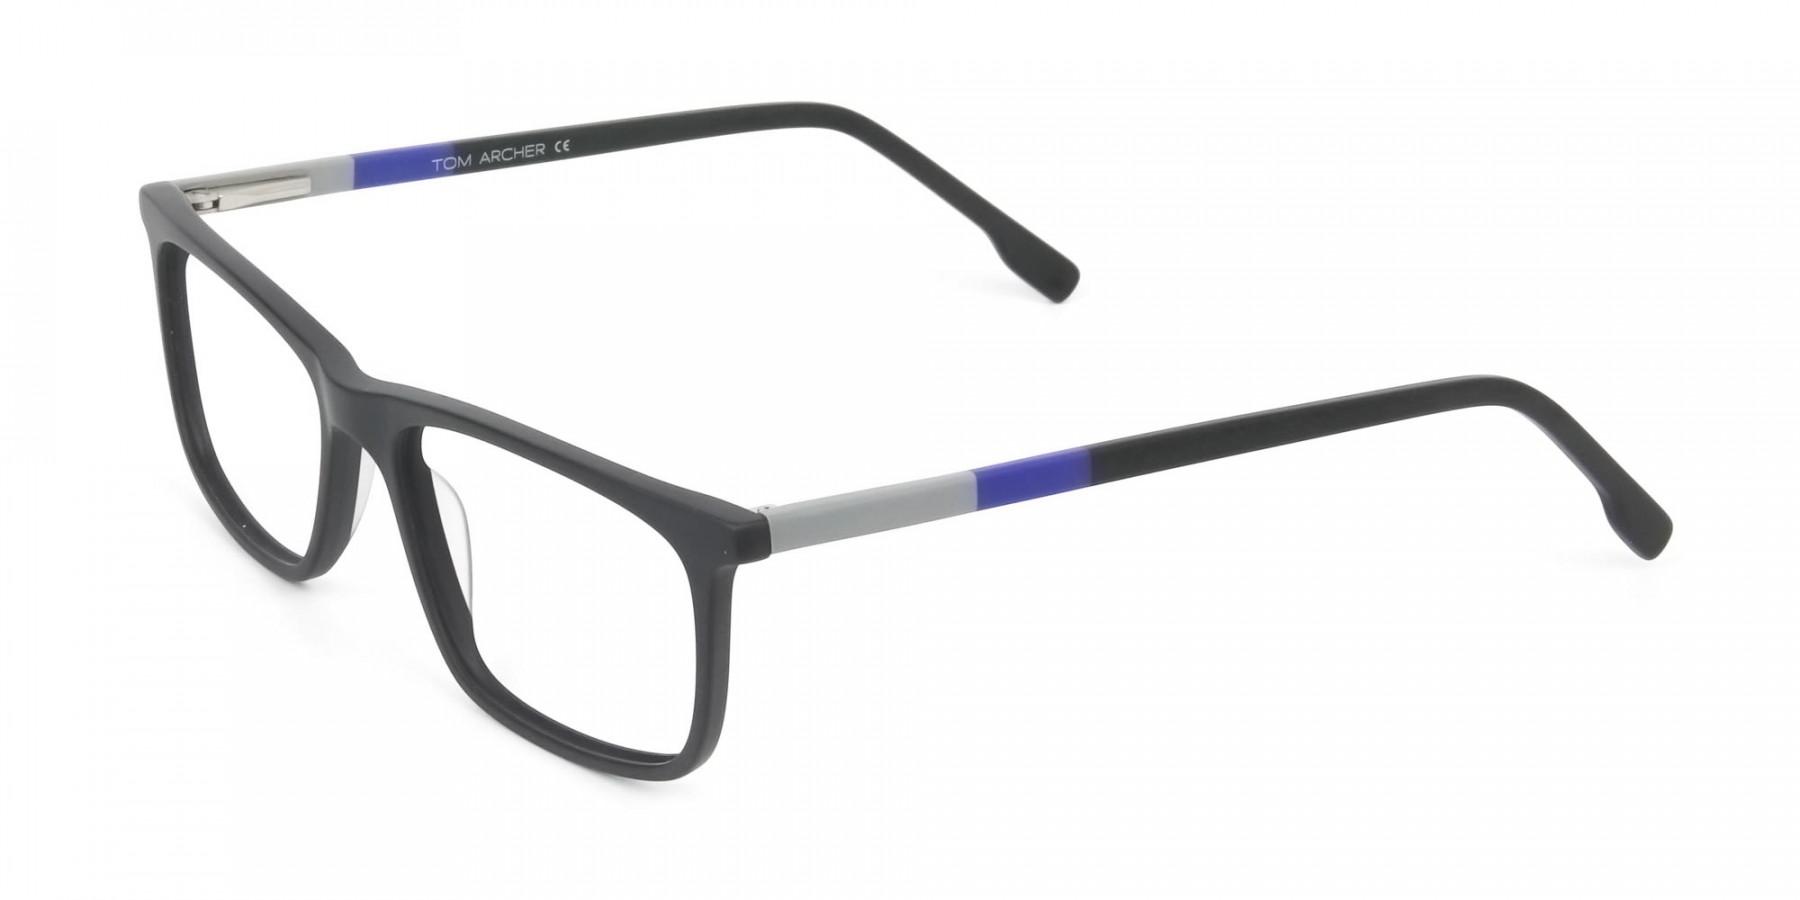 Matte Black & Blue Spectacles in Rectangular - 1